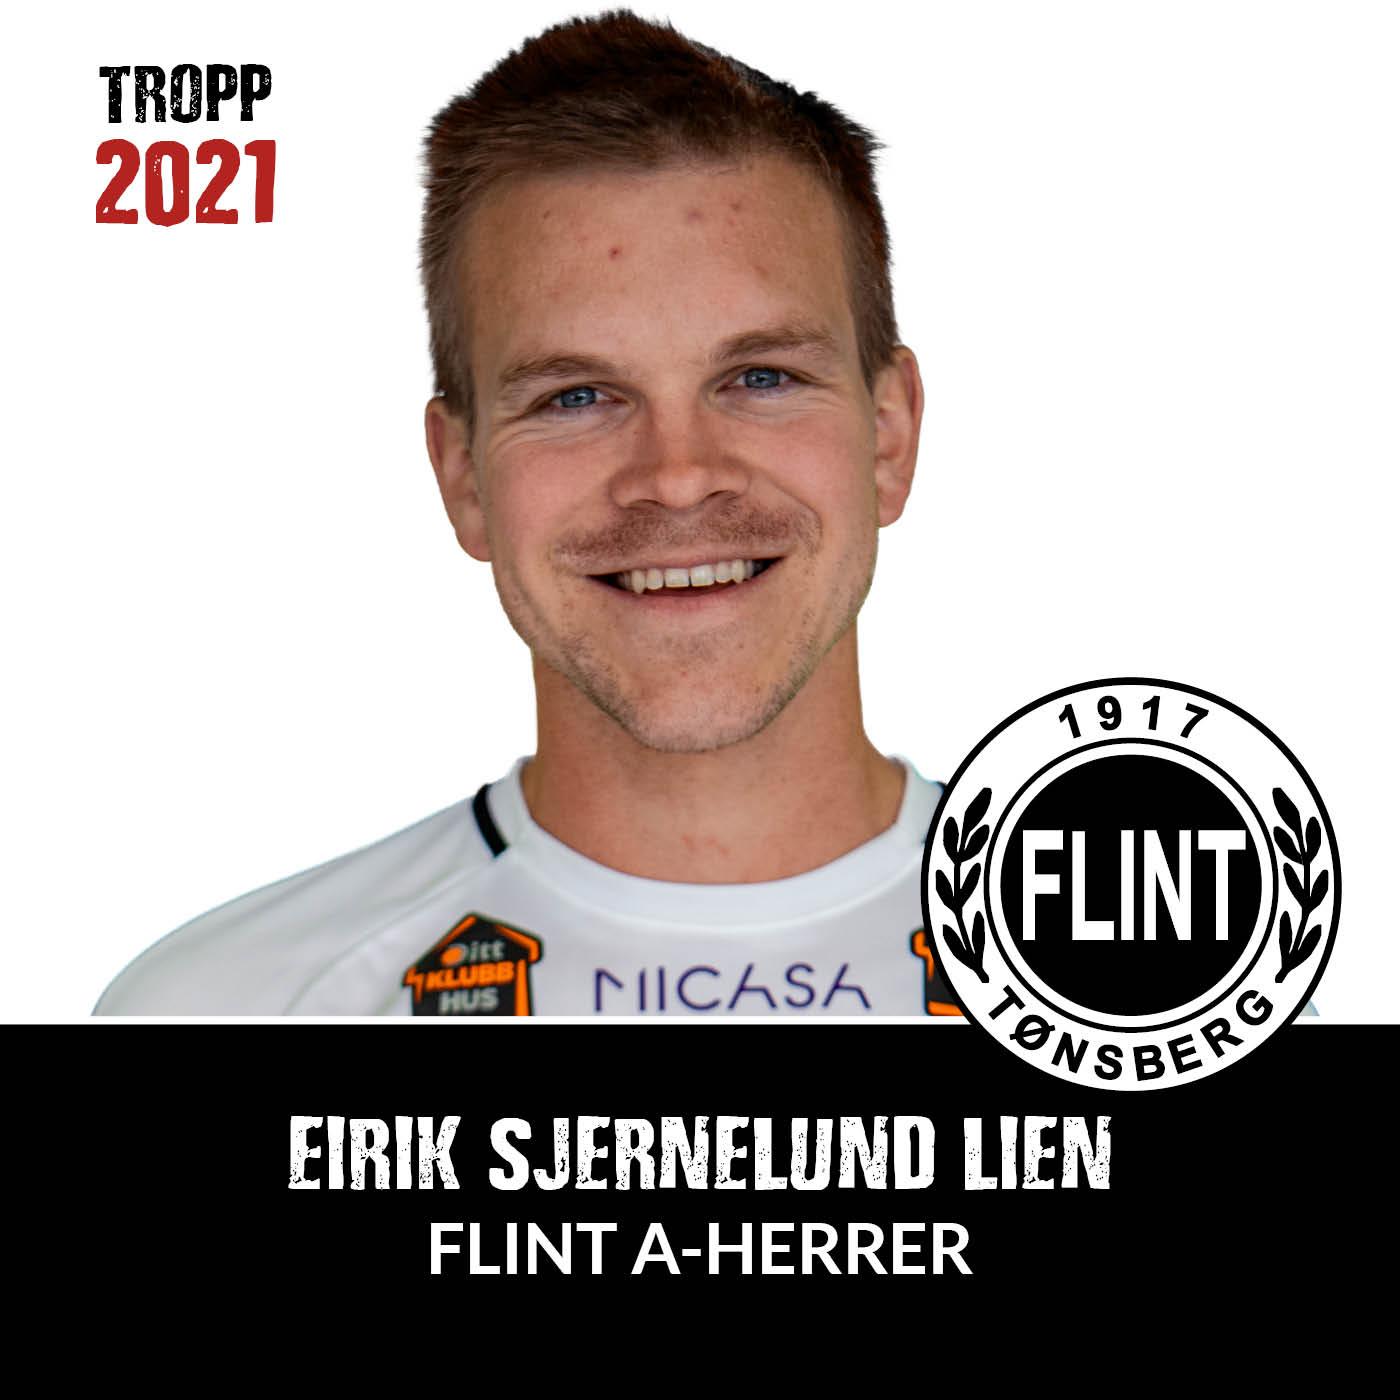 https://www.flintfotball.no/wp-content/uploads/2021/01/A-herrer-2021-Eirik-Stjernelund-Lien.jpg